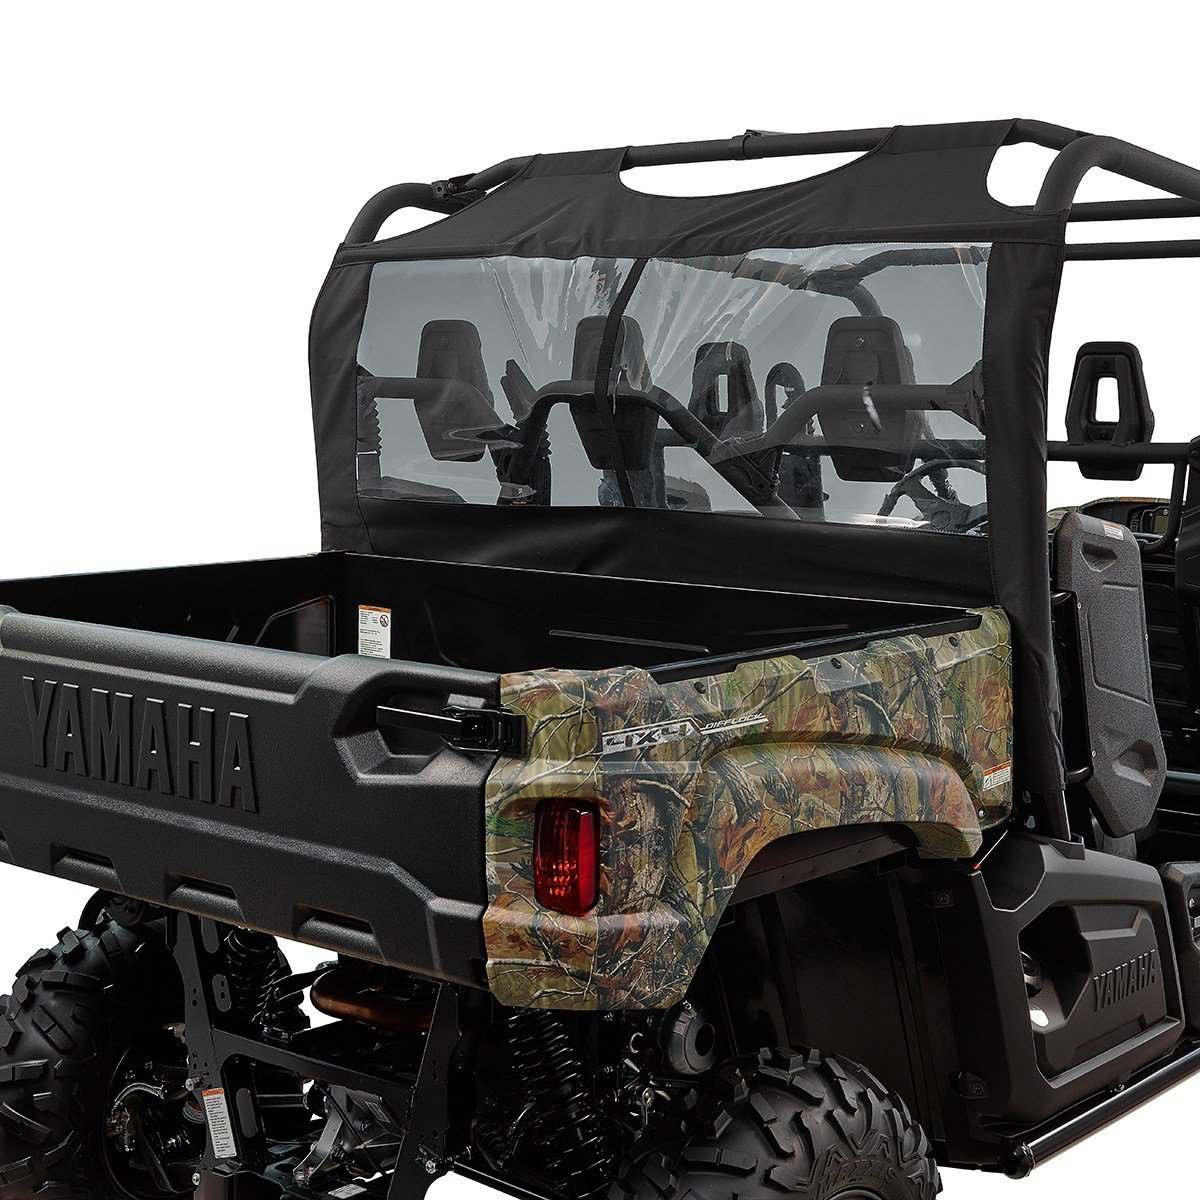 yamaha viking accessories. amazon.com: 2015 yamaha viking fi 4x4 rear window surlast all weather fade resistant 2pgk750av000: automotive yamaha viking accessories